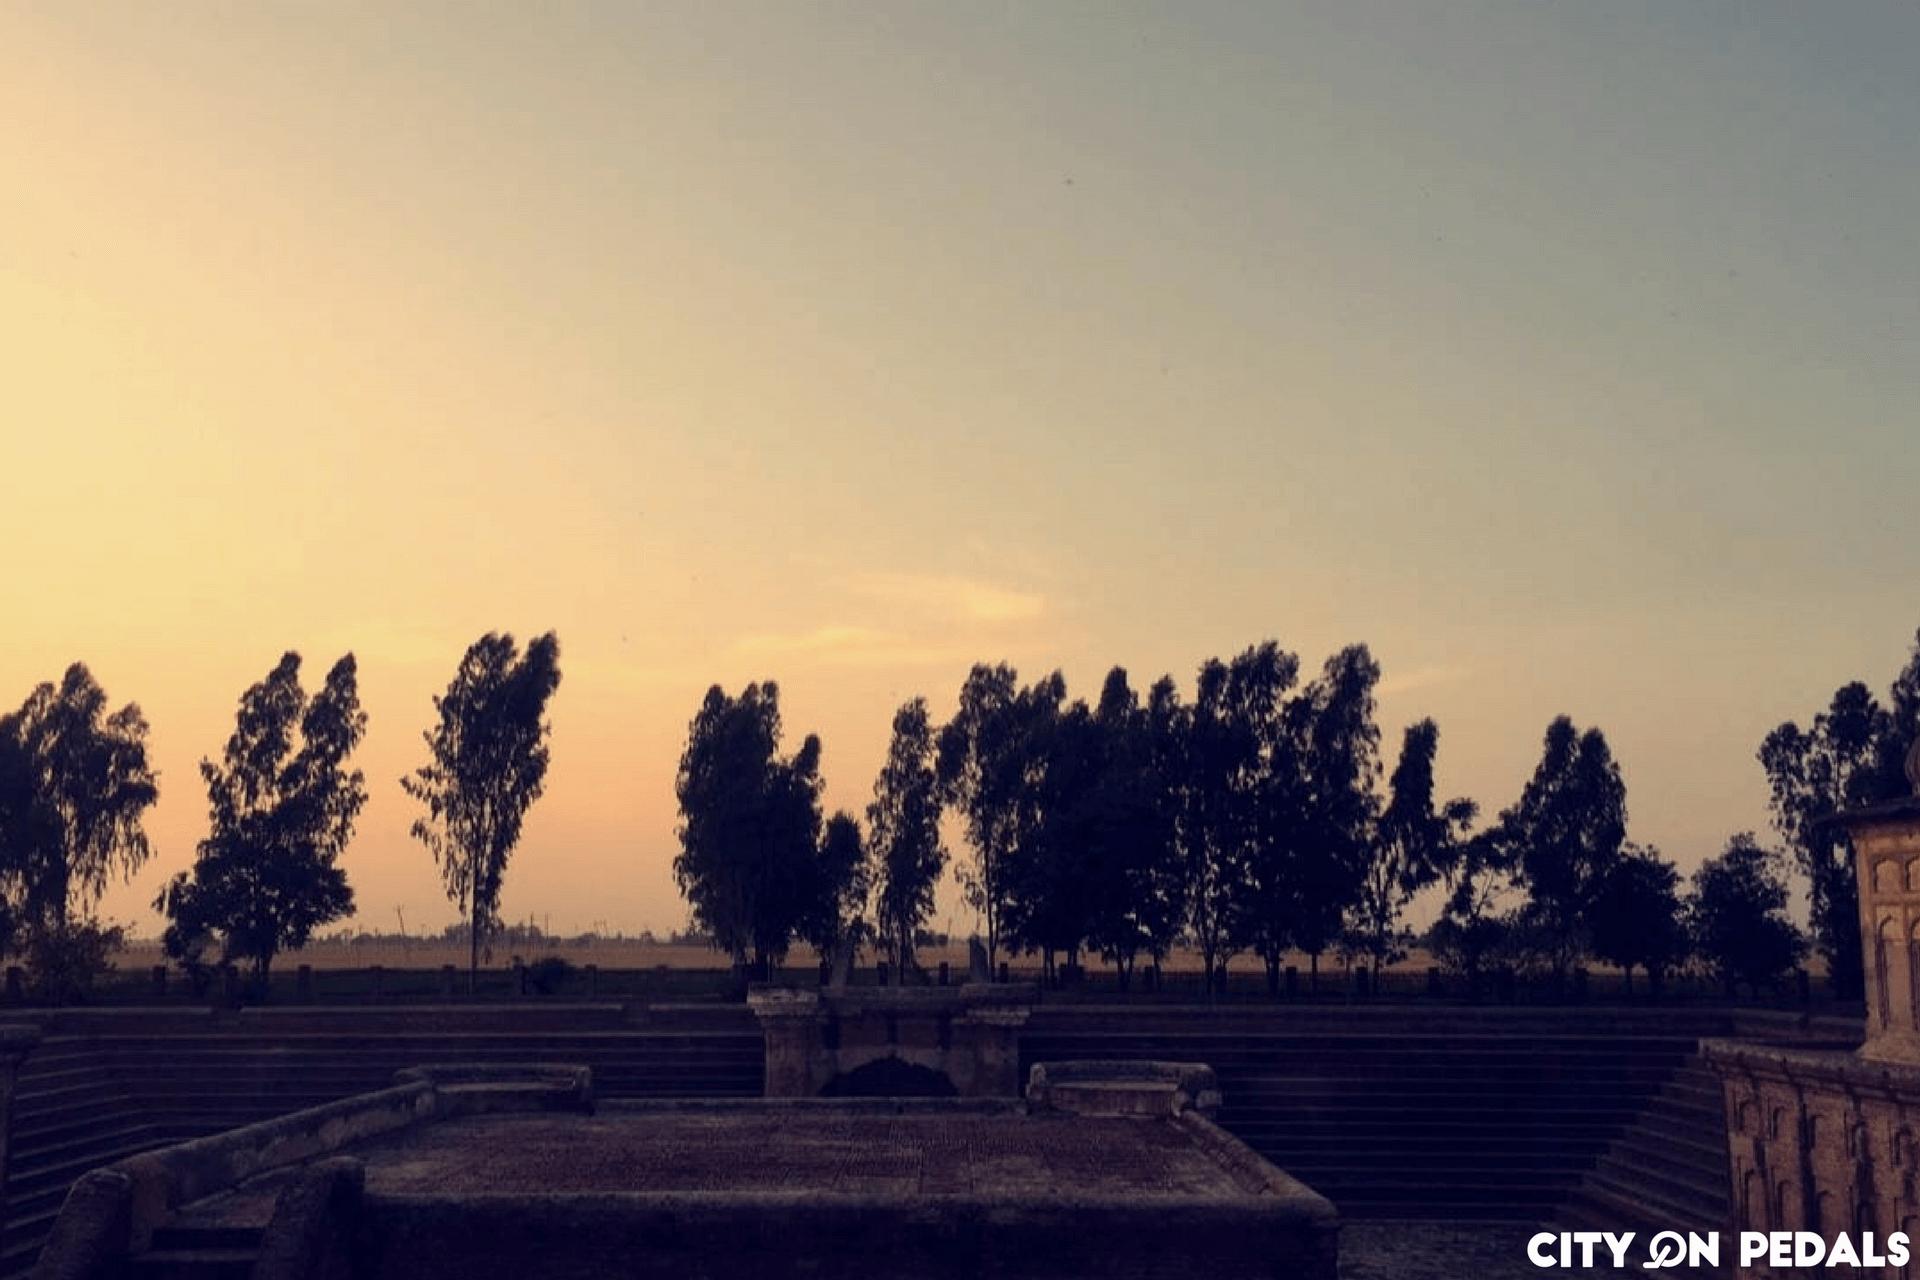 Sunset at Pul Kanjari